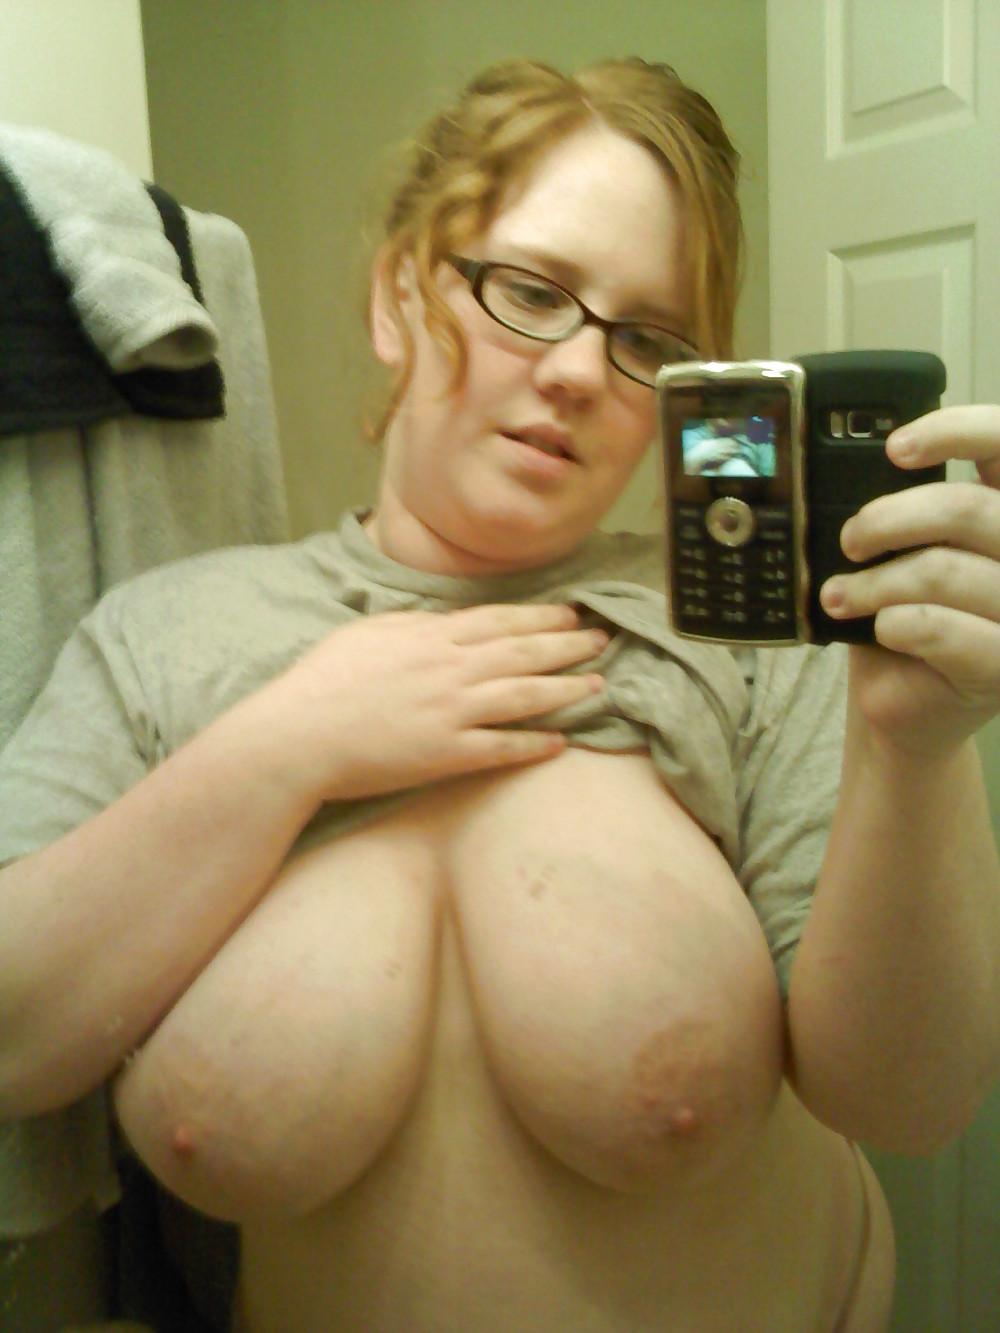 Chubby Naked Selfie Girl Big Tits